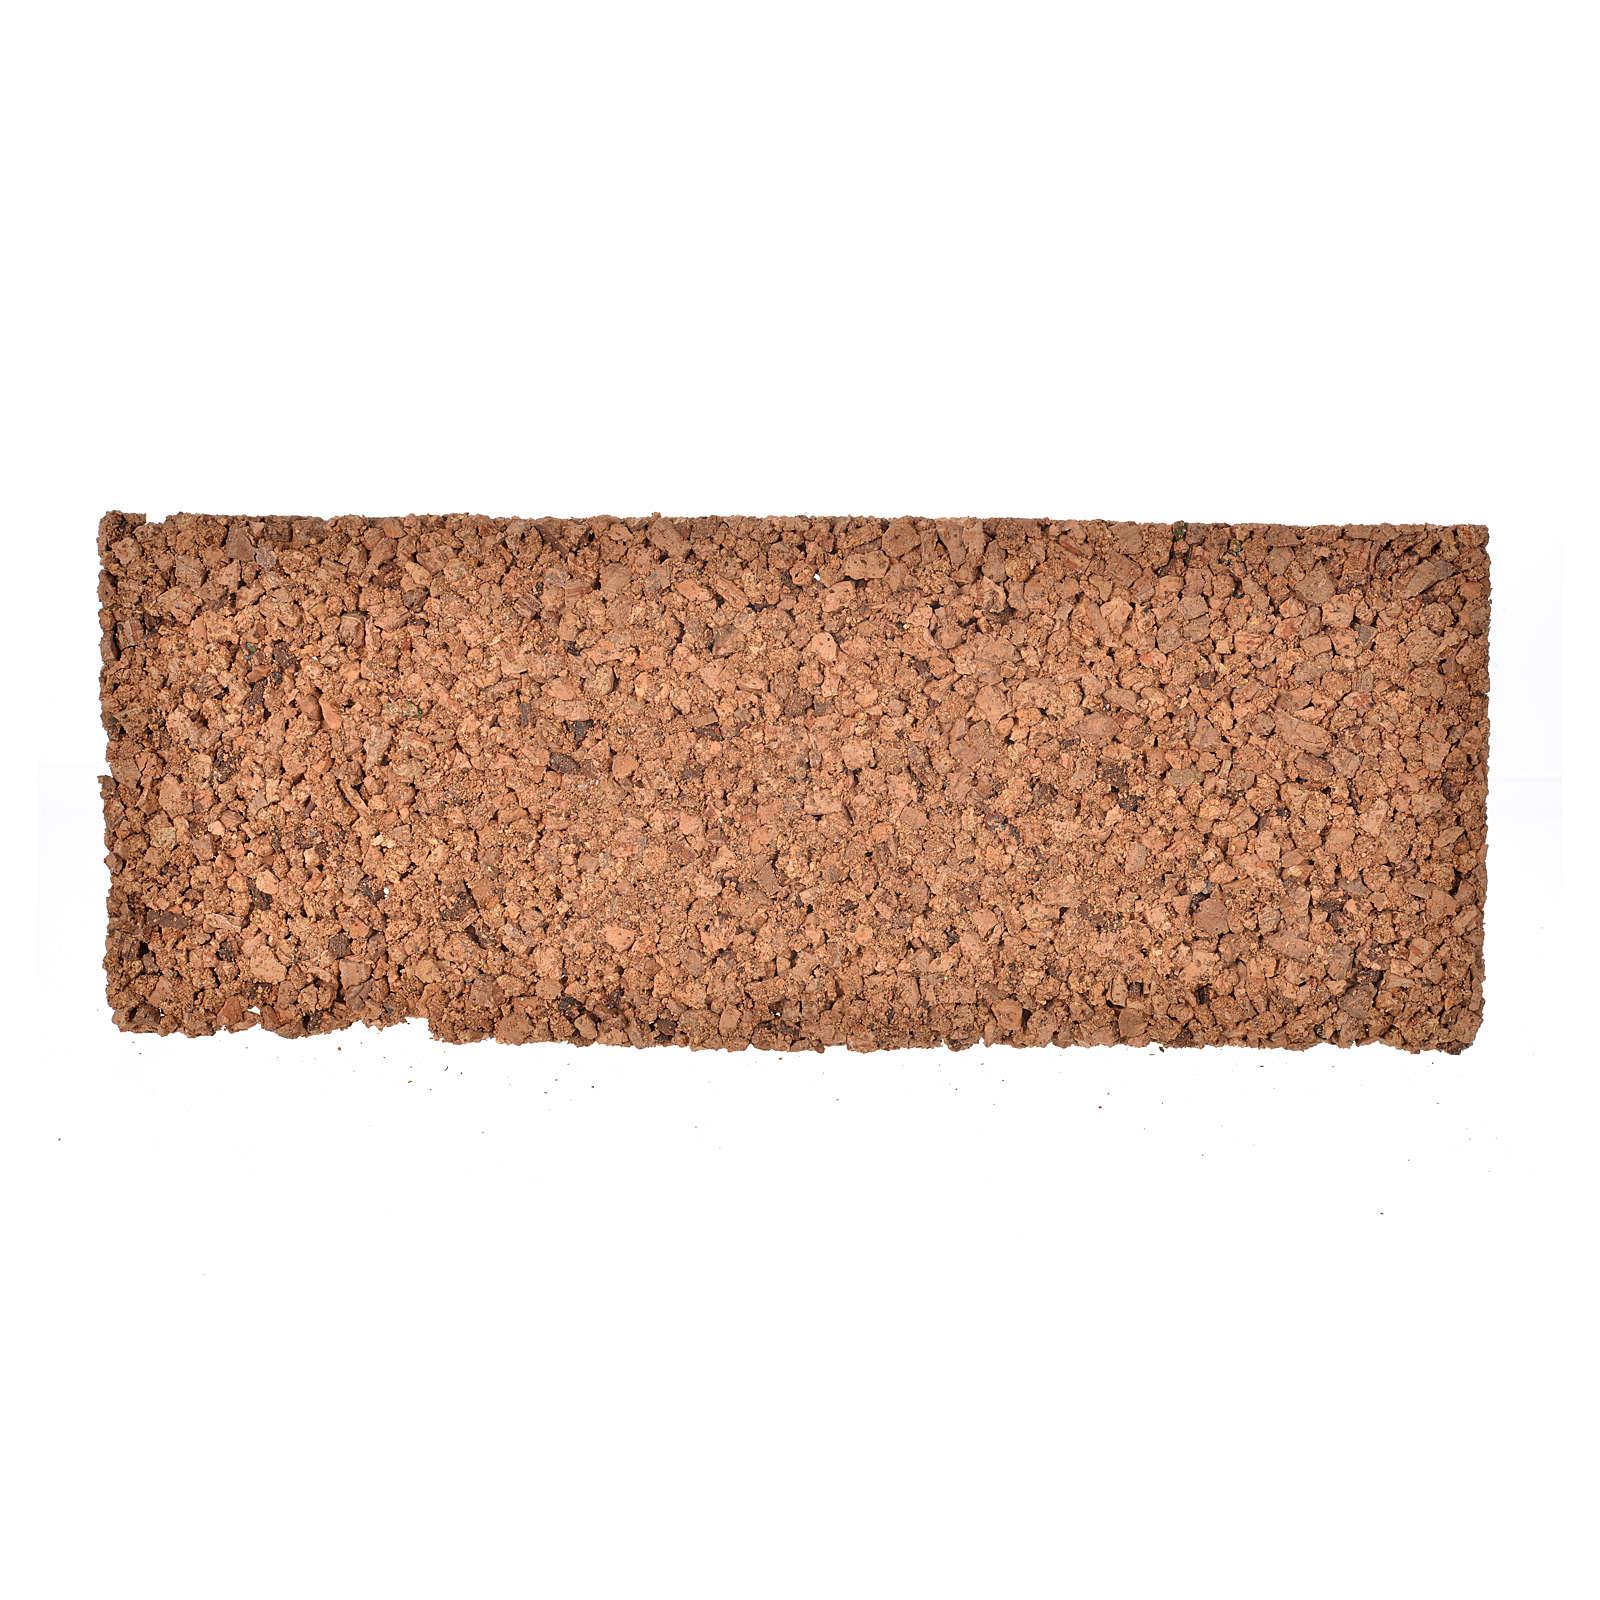 Panneau liège imitation roches 33x12,5x1 4